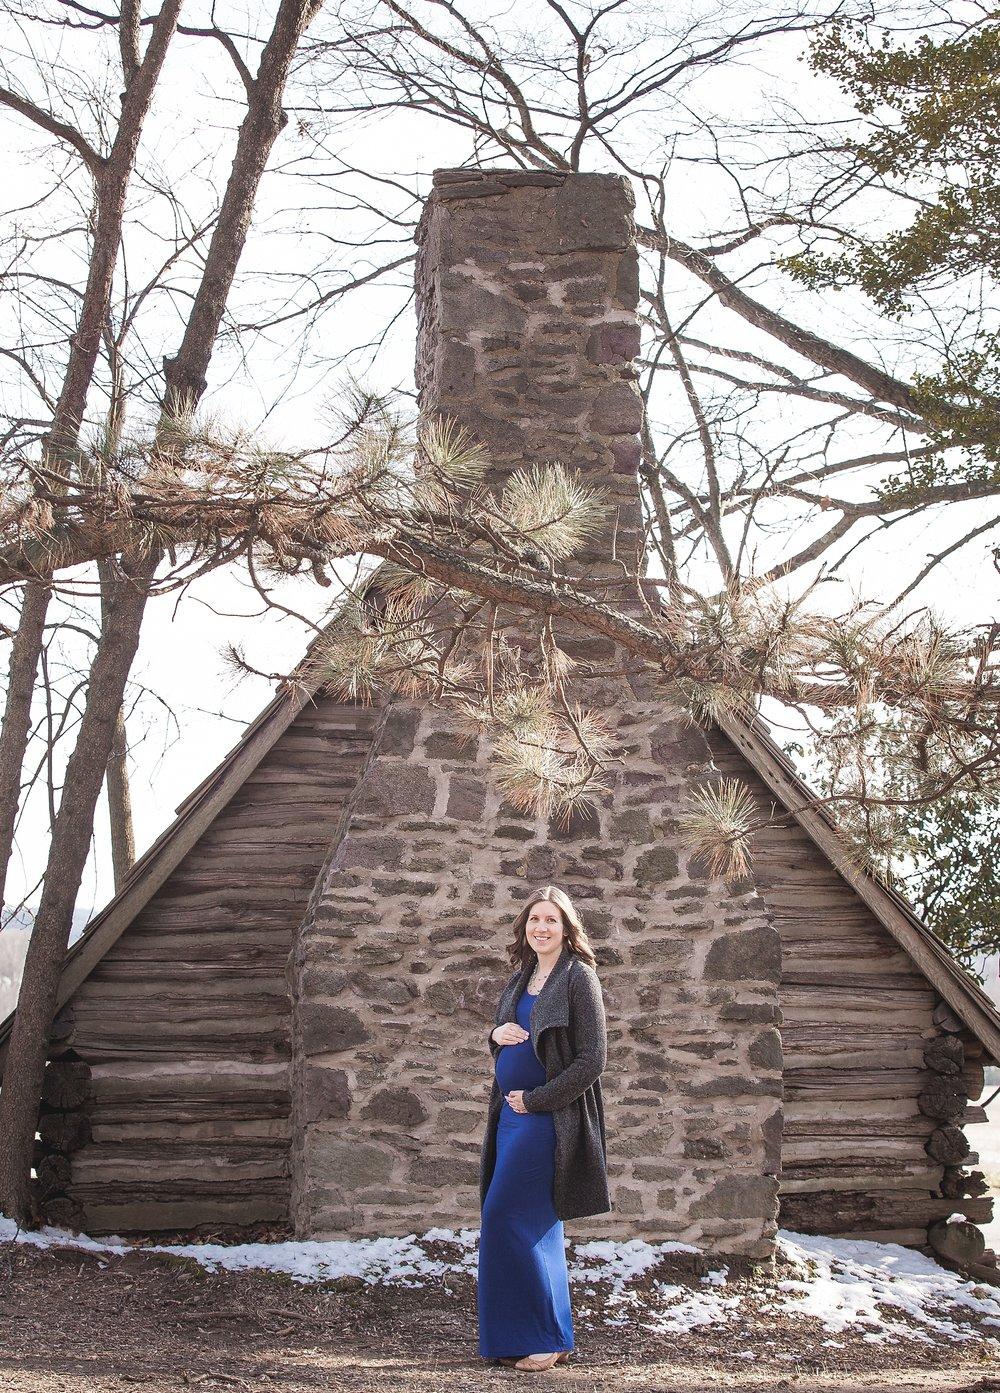 Joe_Mac_Creative_Maternity_Wedding_Engagements_Photography_Philadelphia_Valley_Forge__0021.jpg